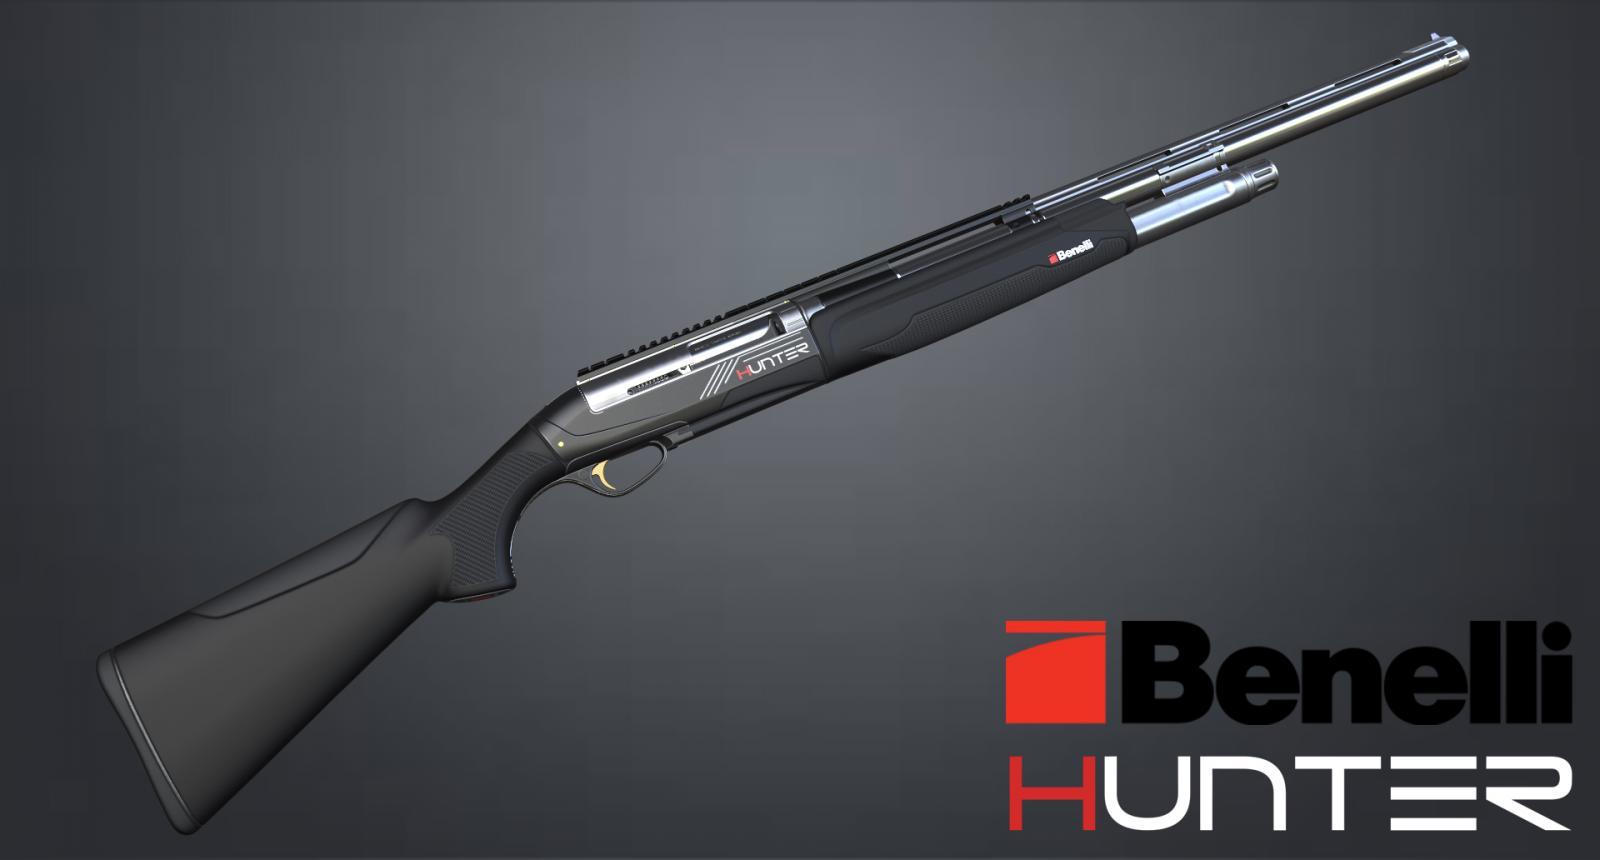 Benelli Hunter